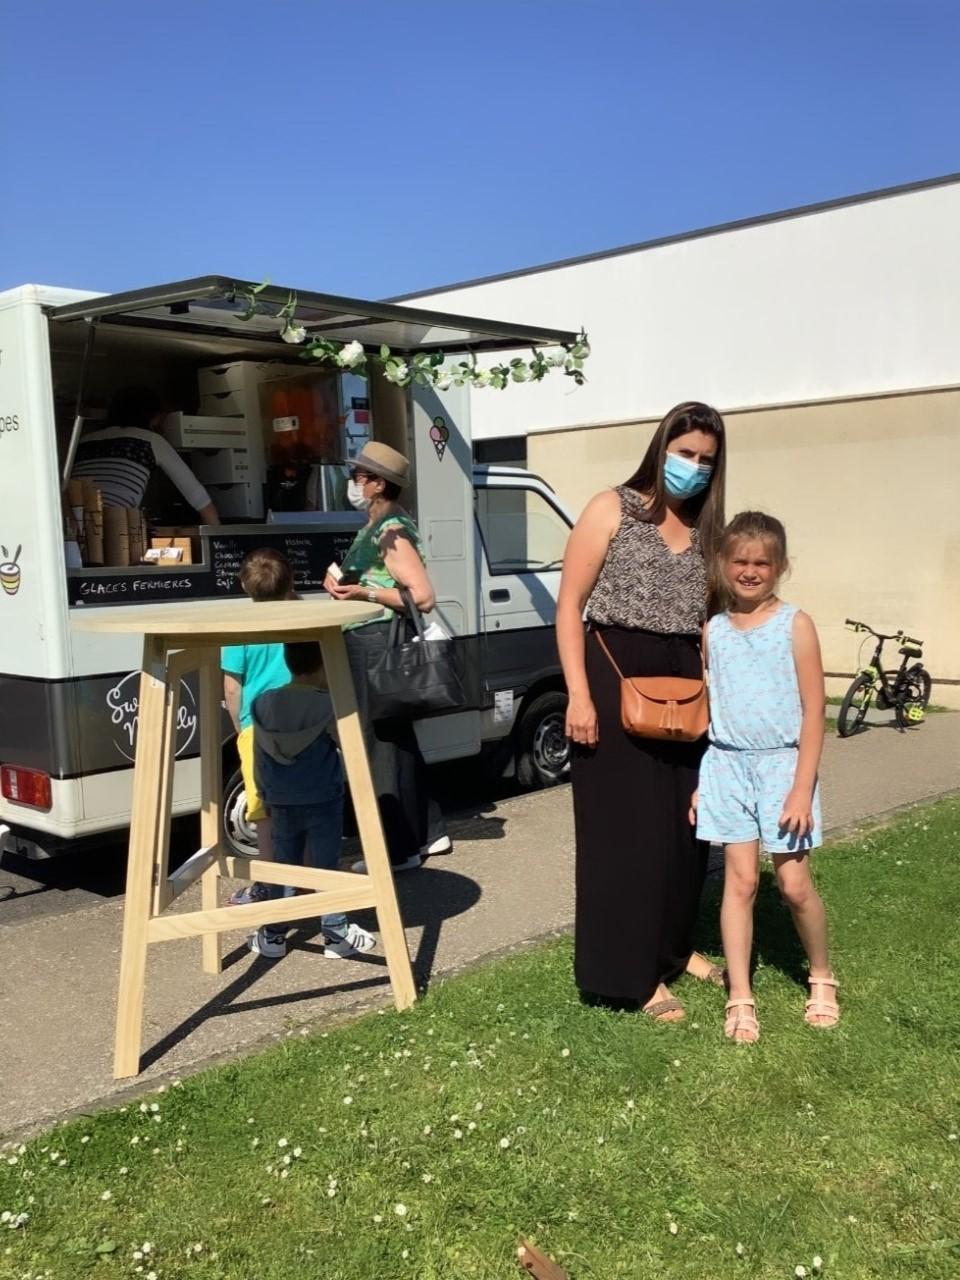 Food Truck - Glacier à Fresnes-sur-Marne